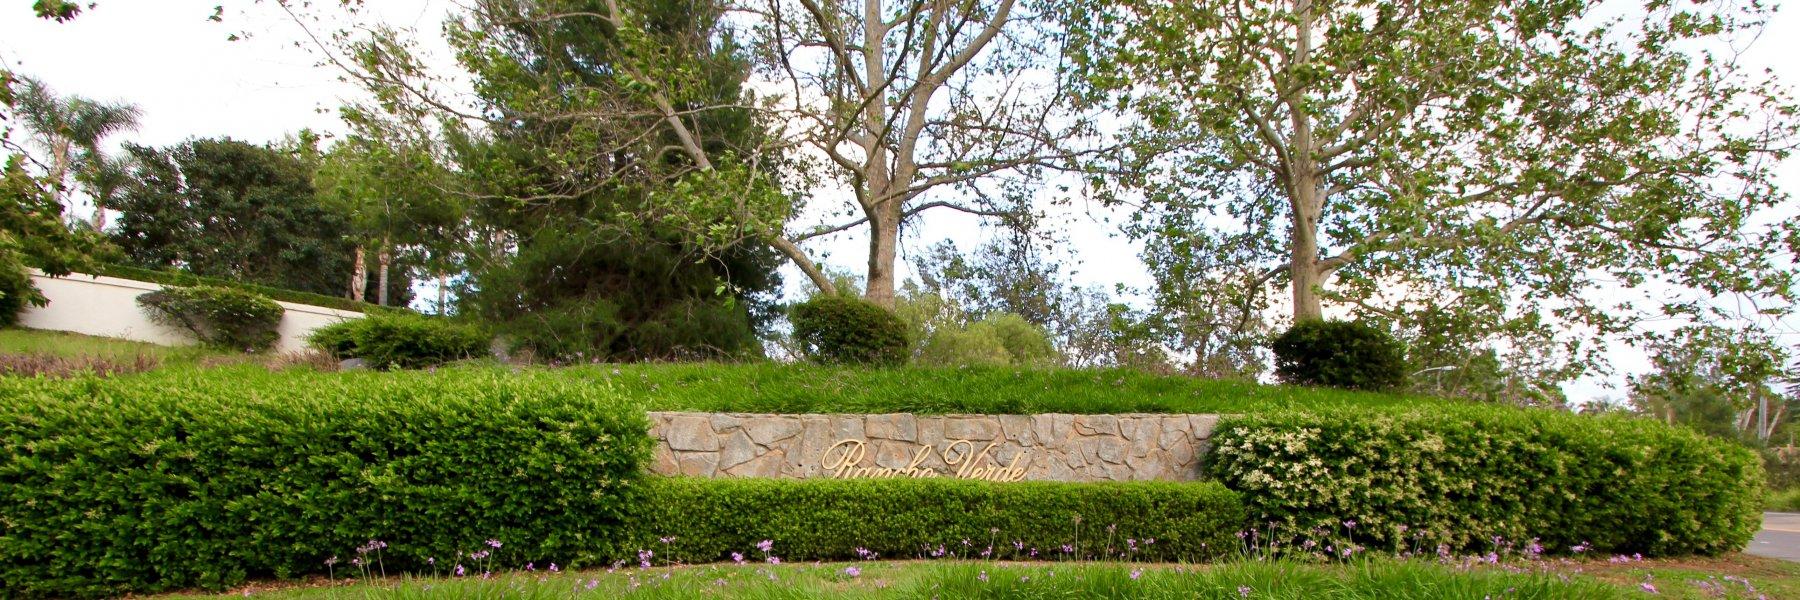 Rancho Verde is a community of homes in Escondido California